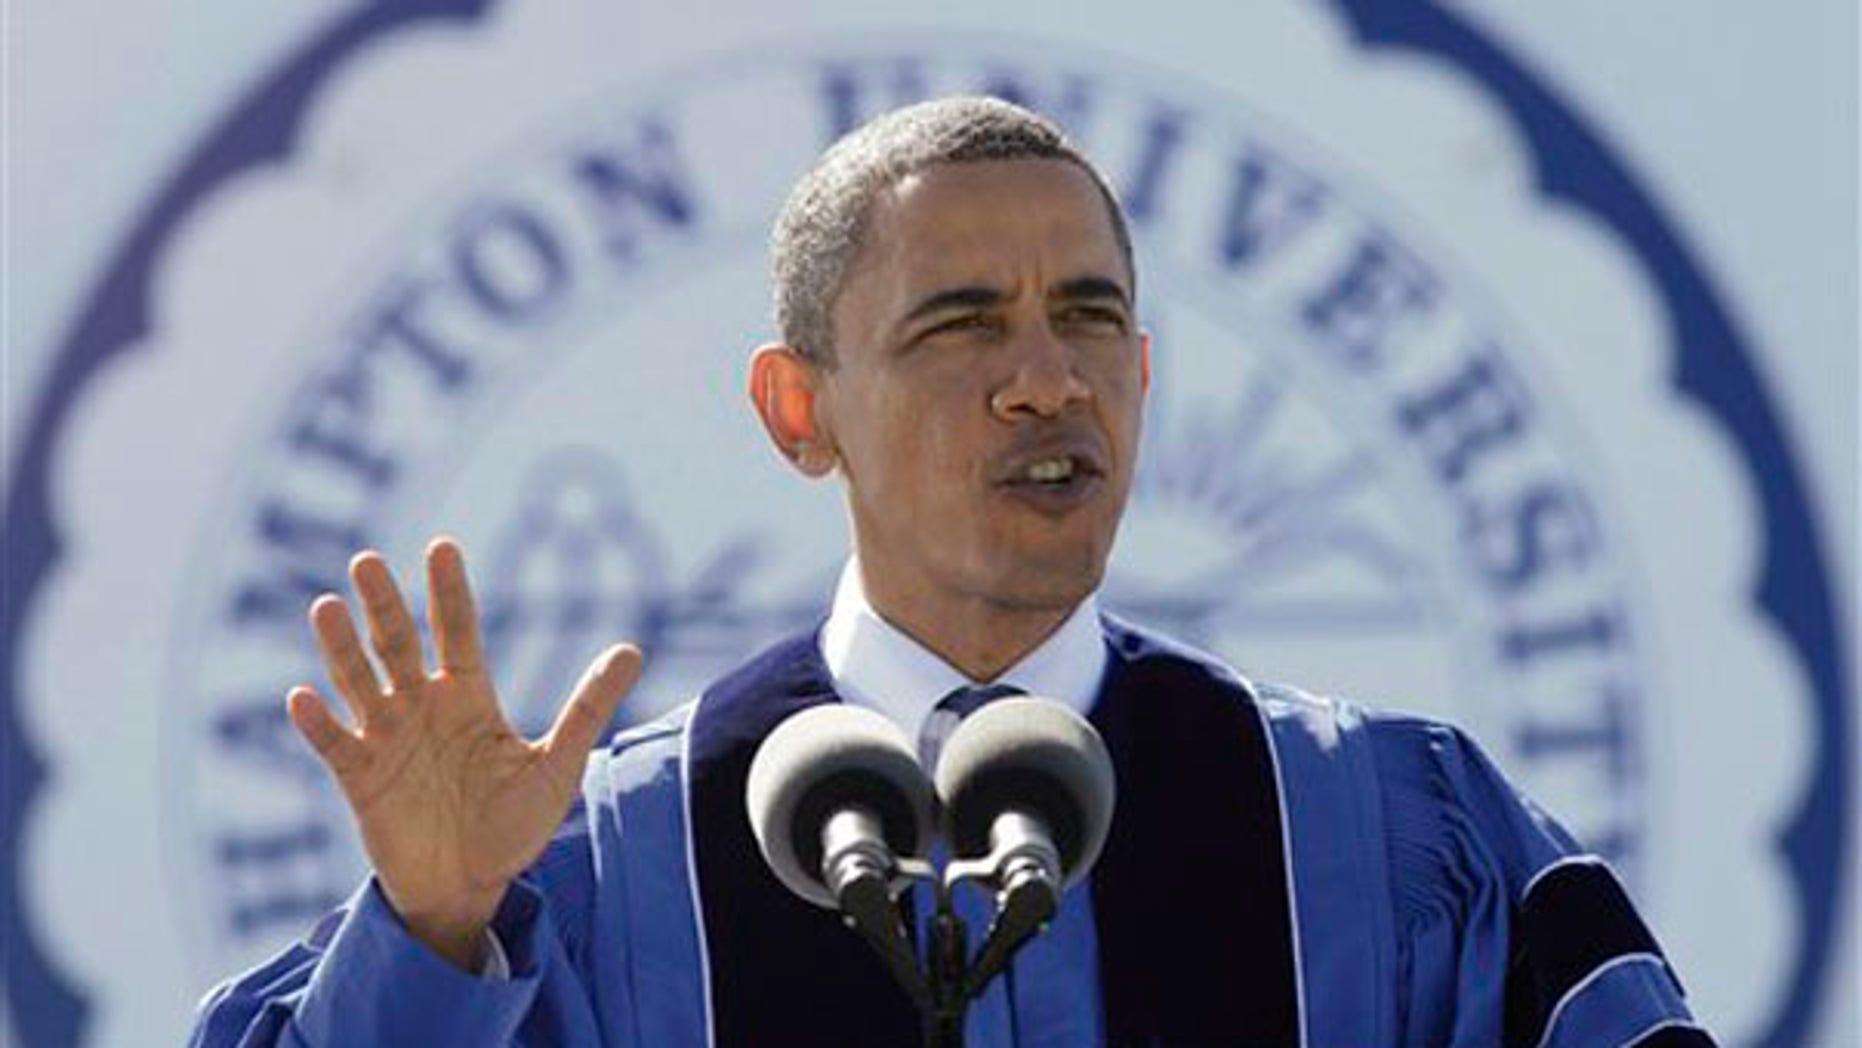 President Obama speaks to the graduating class at Hampton University in Hampton, Va., May 9. (AP Photo)